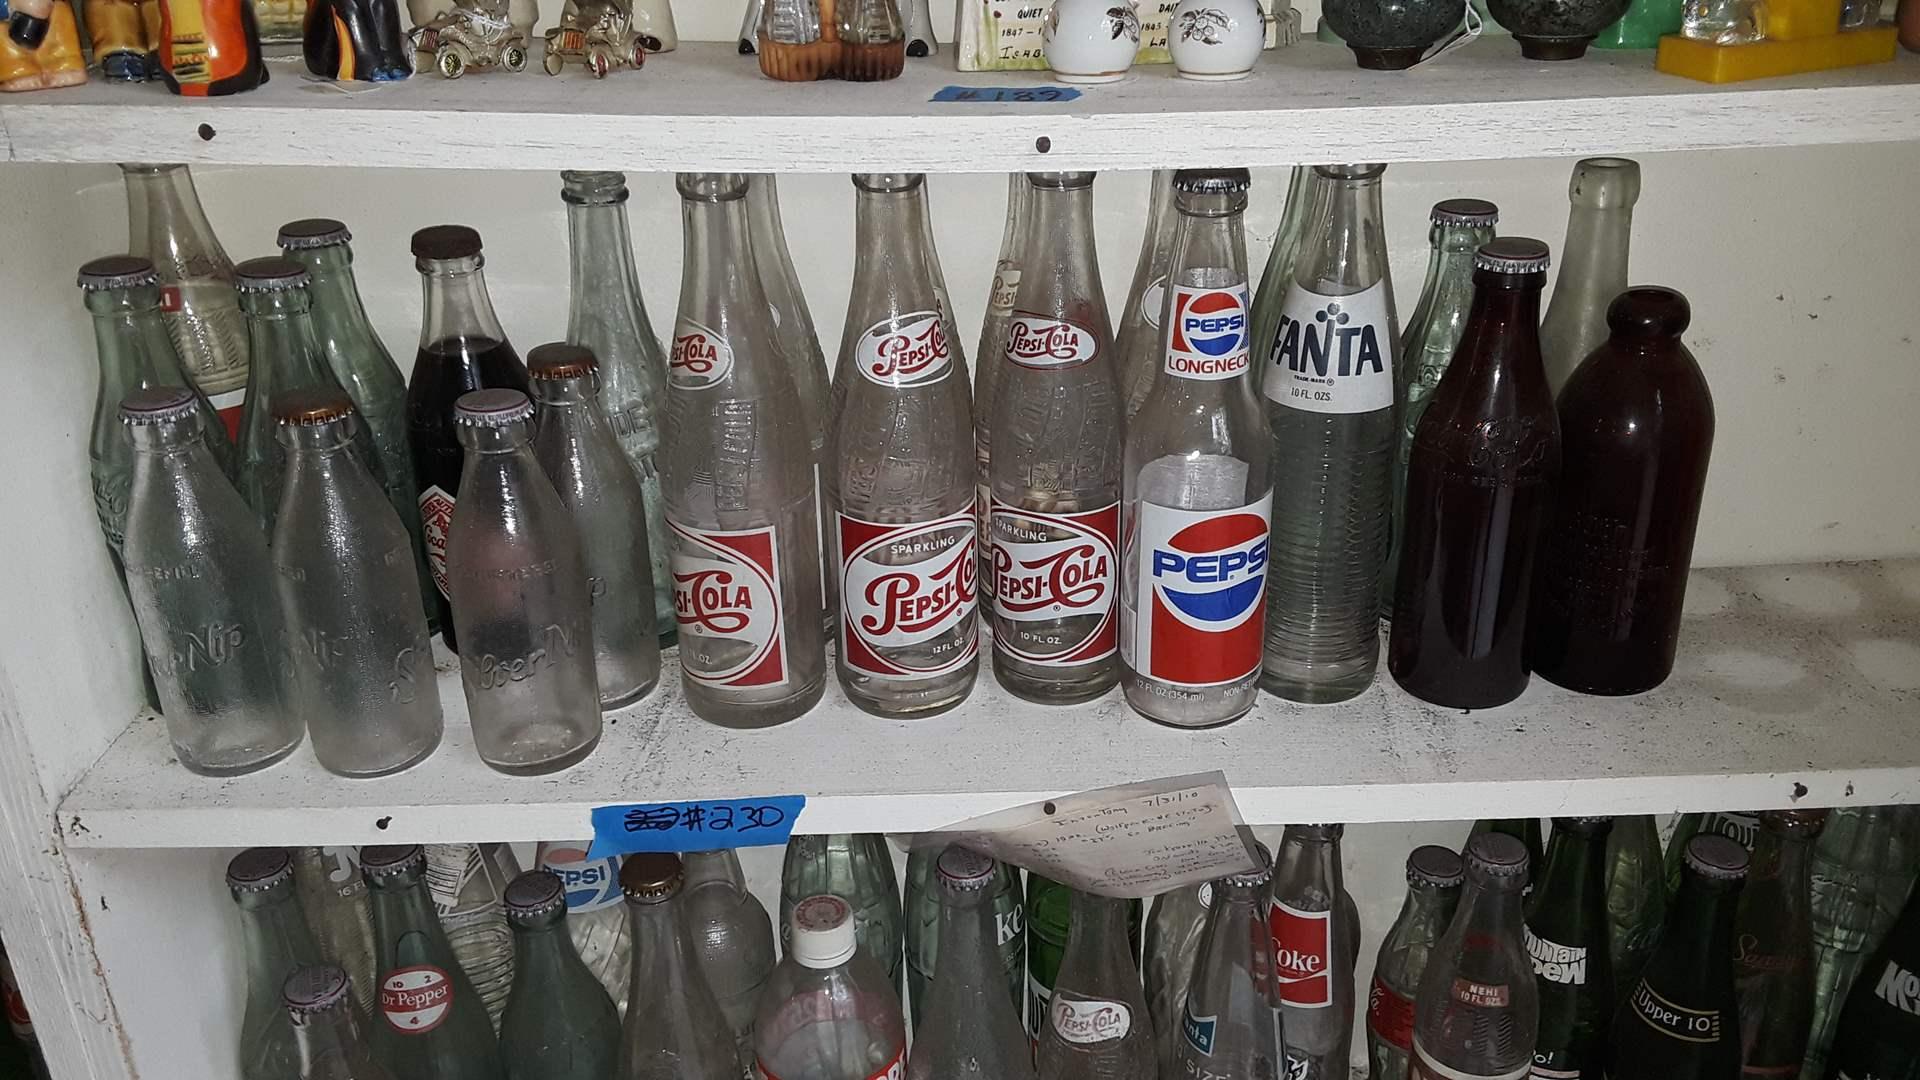 Lot # 230 COLLECTIBLE SODA BOTTLES, PEPSI COLA RED LETTERING, FANTA, COKE, SILVER NIP JUICE BOTTLES